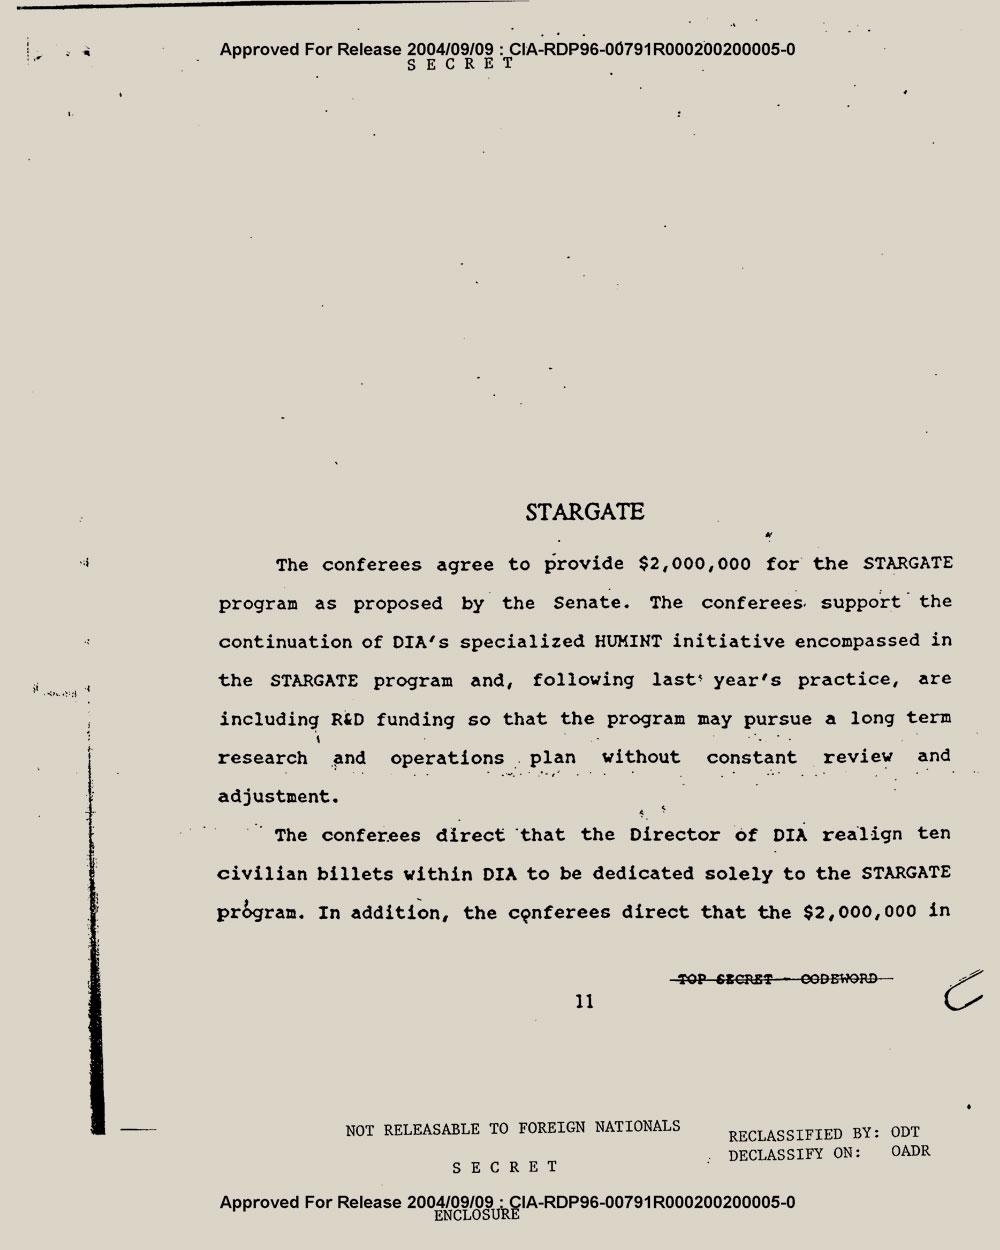 Stargate   CIA document